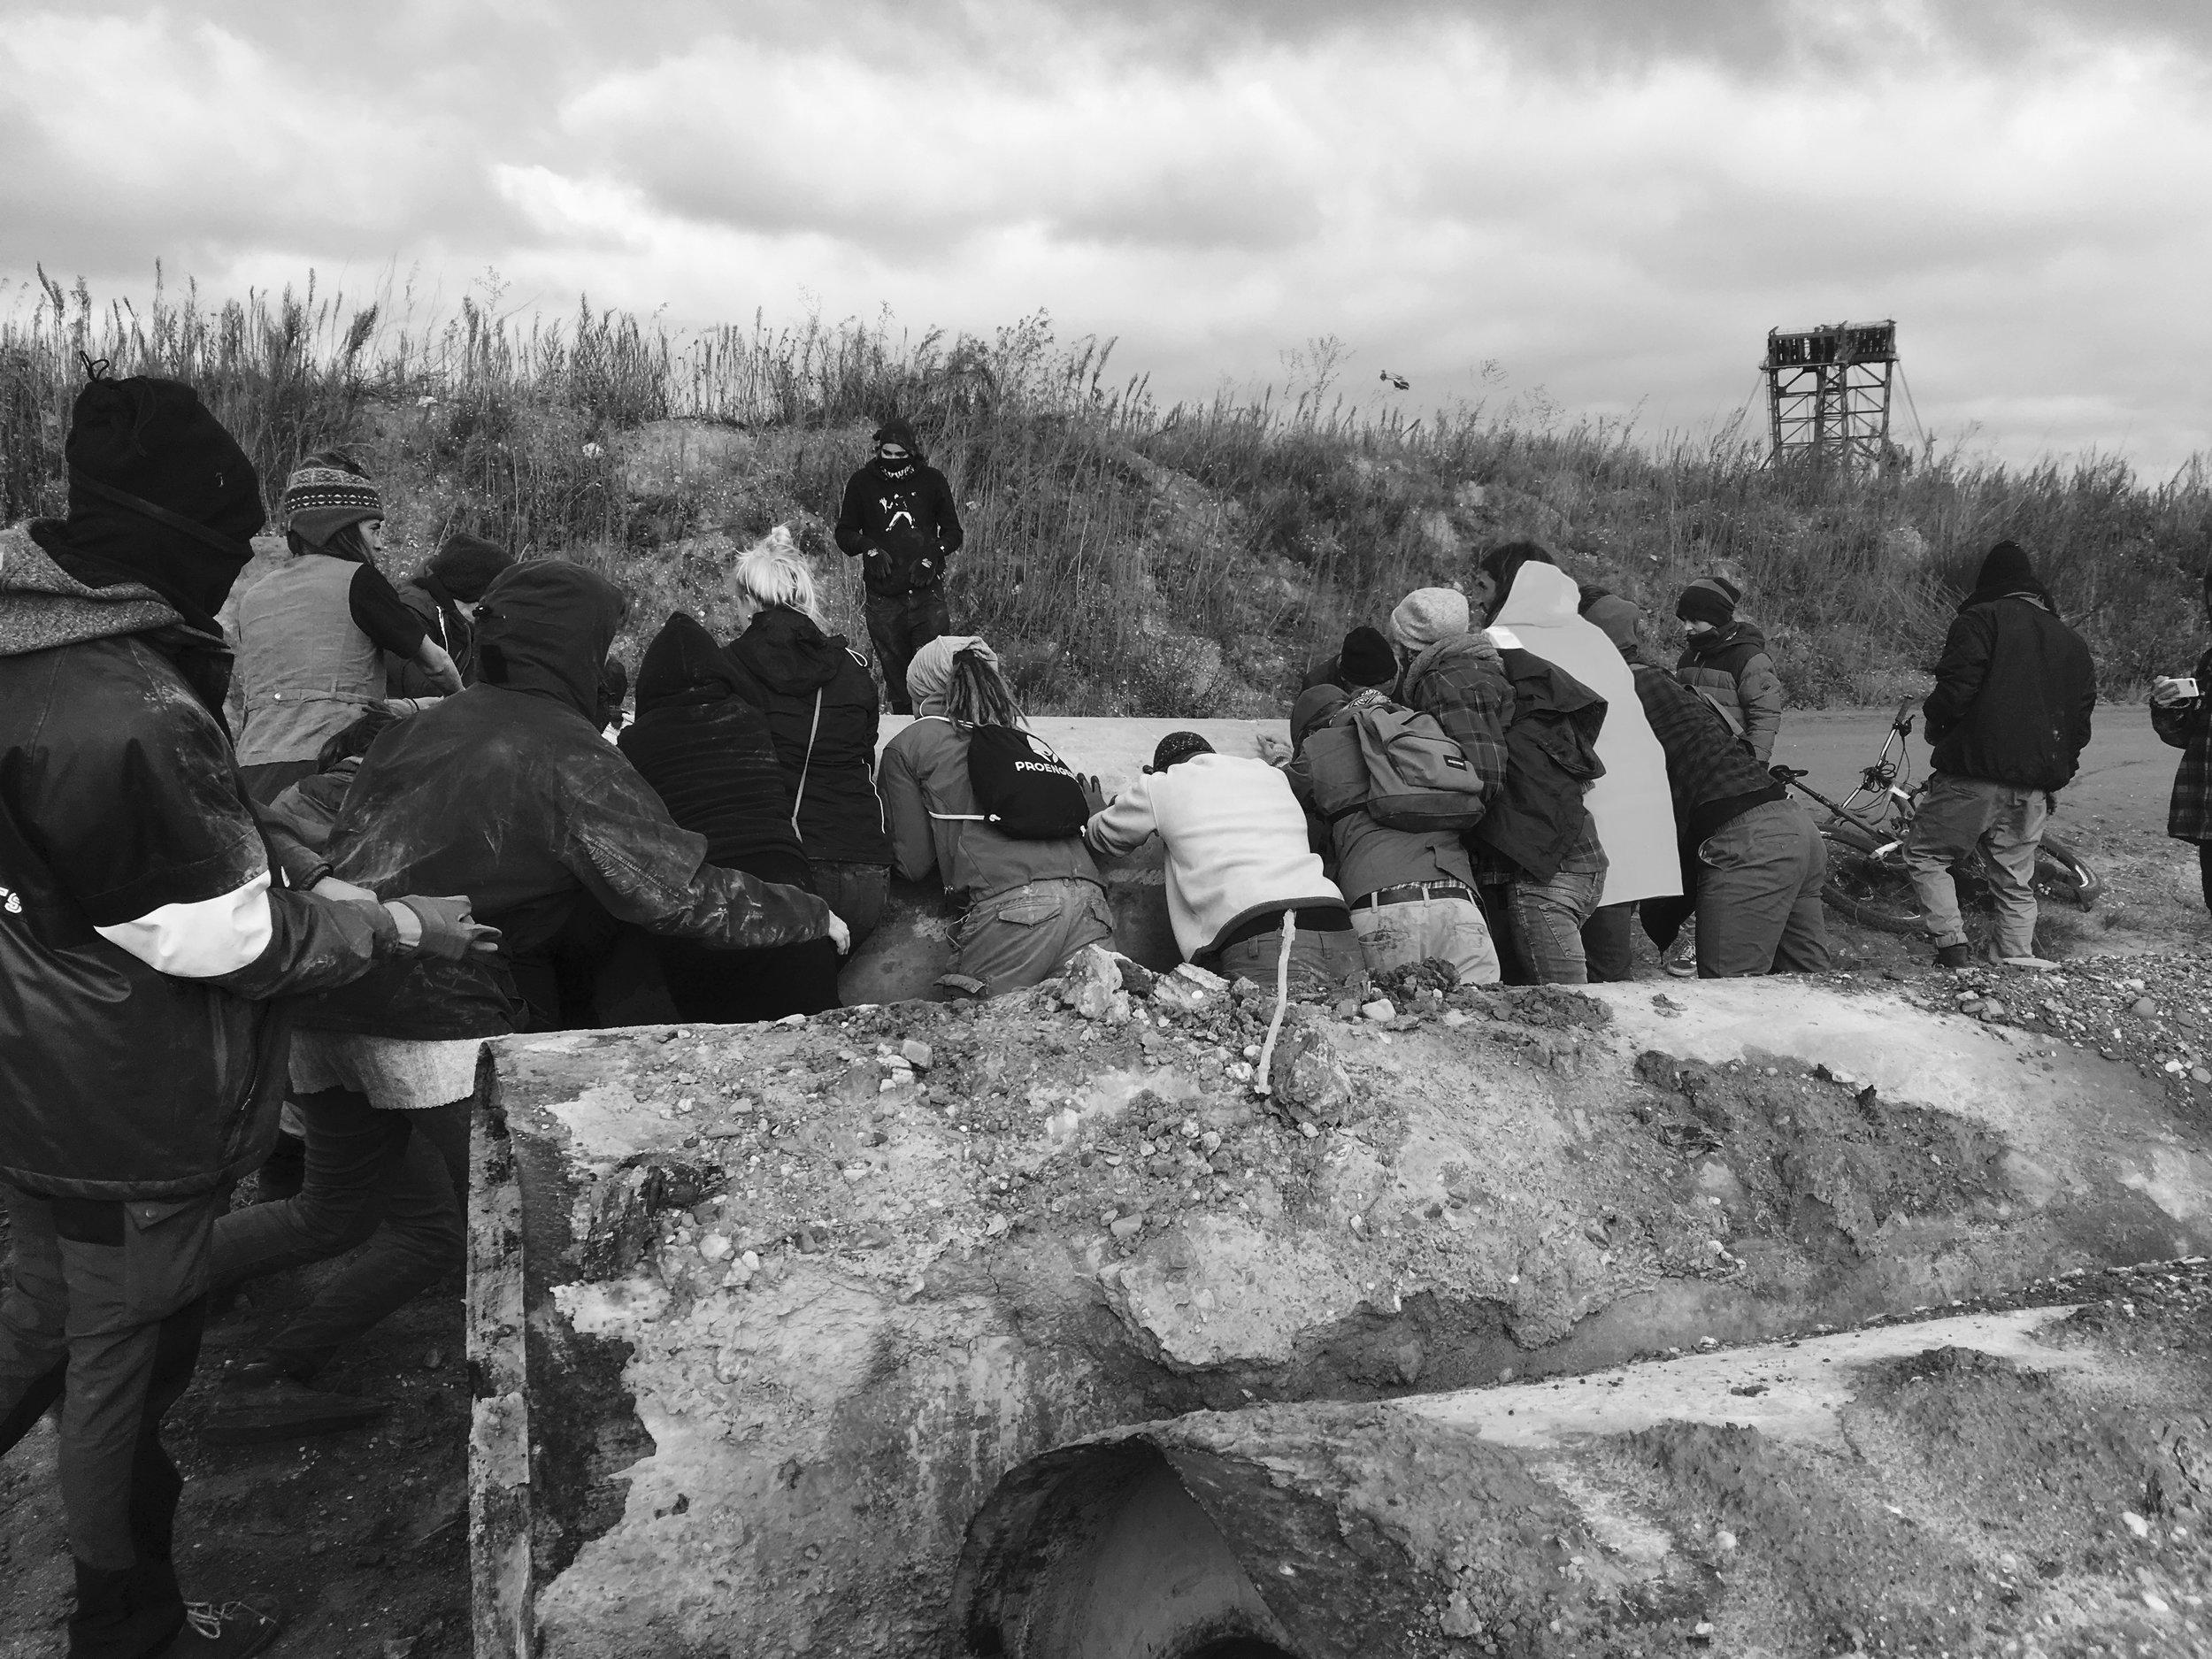 Des activistes construisent des barricades à la mine de Hambach, le 27 octobre.